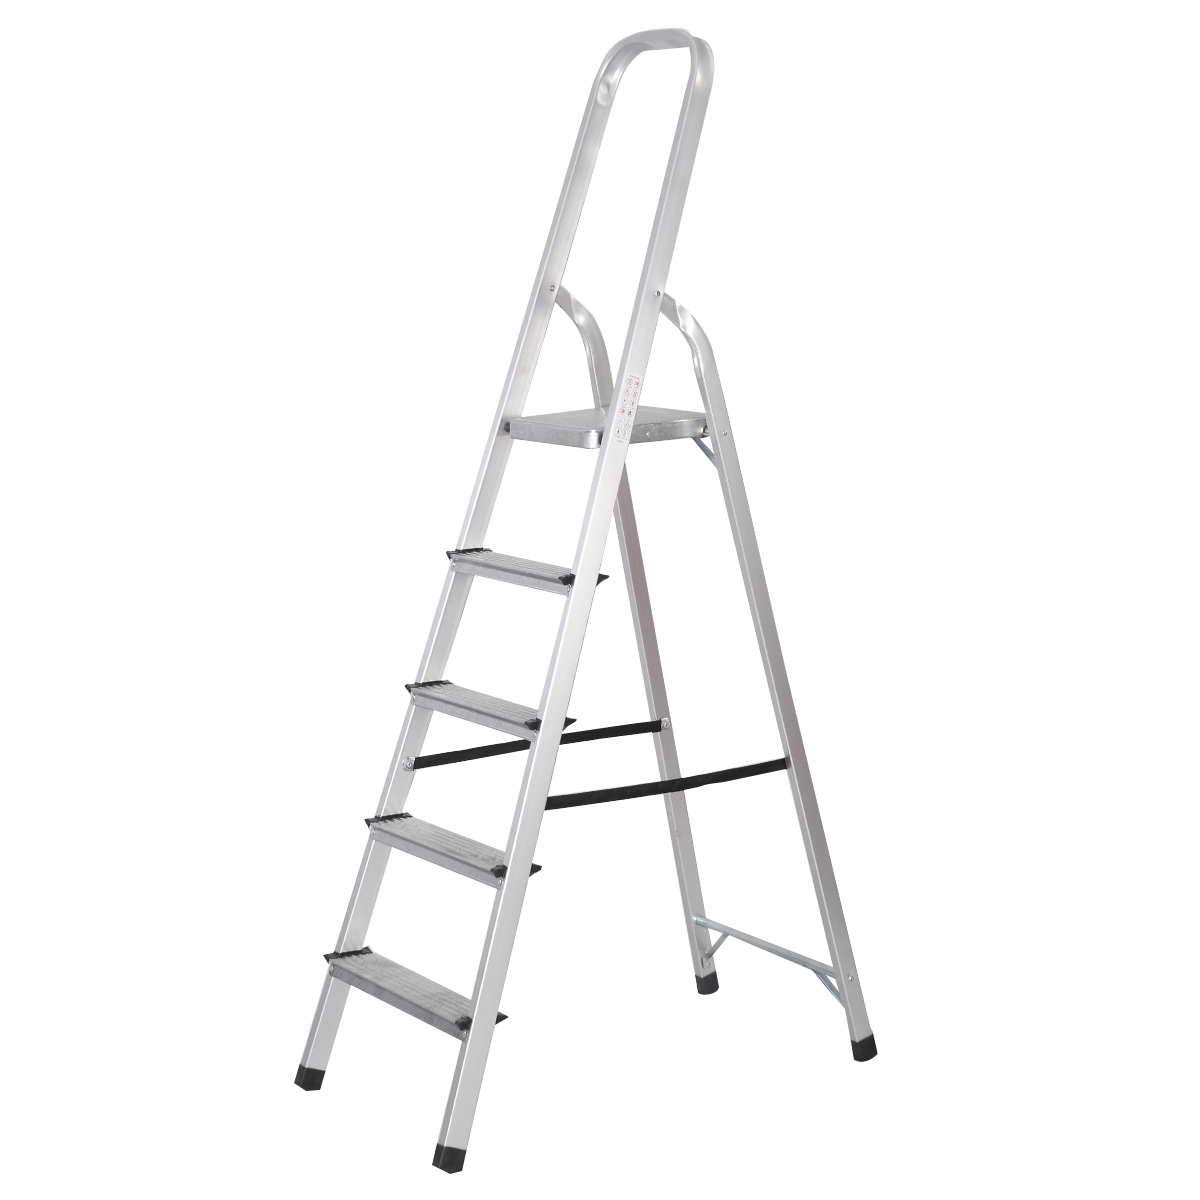 Toolsempire Foldable 5 Step Ladder Non-Slip 330 lbs Capacity Platform Aluminum New